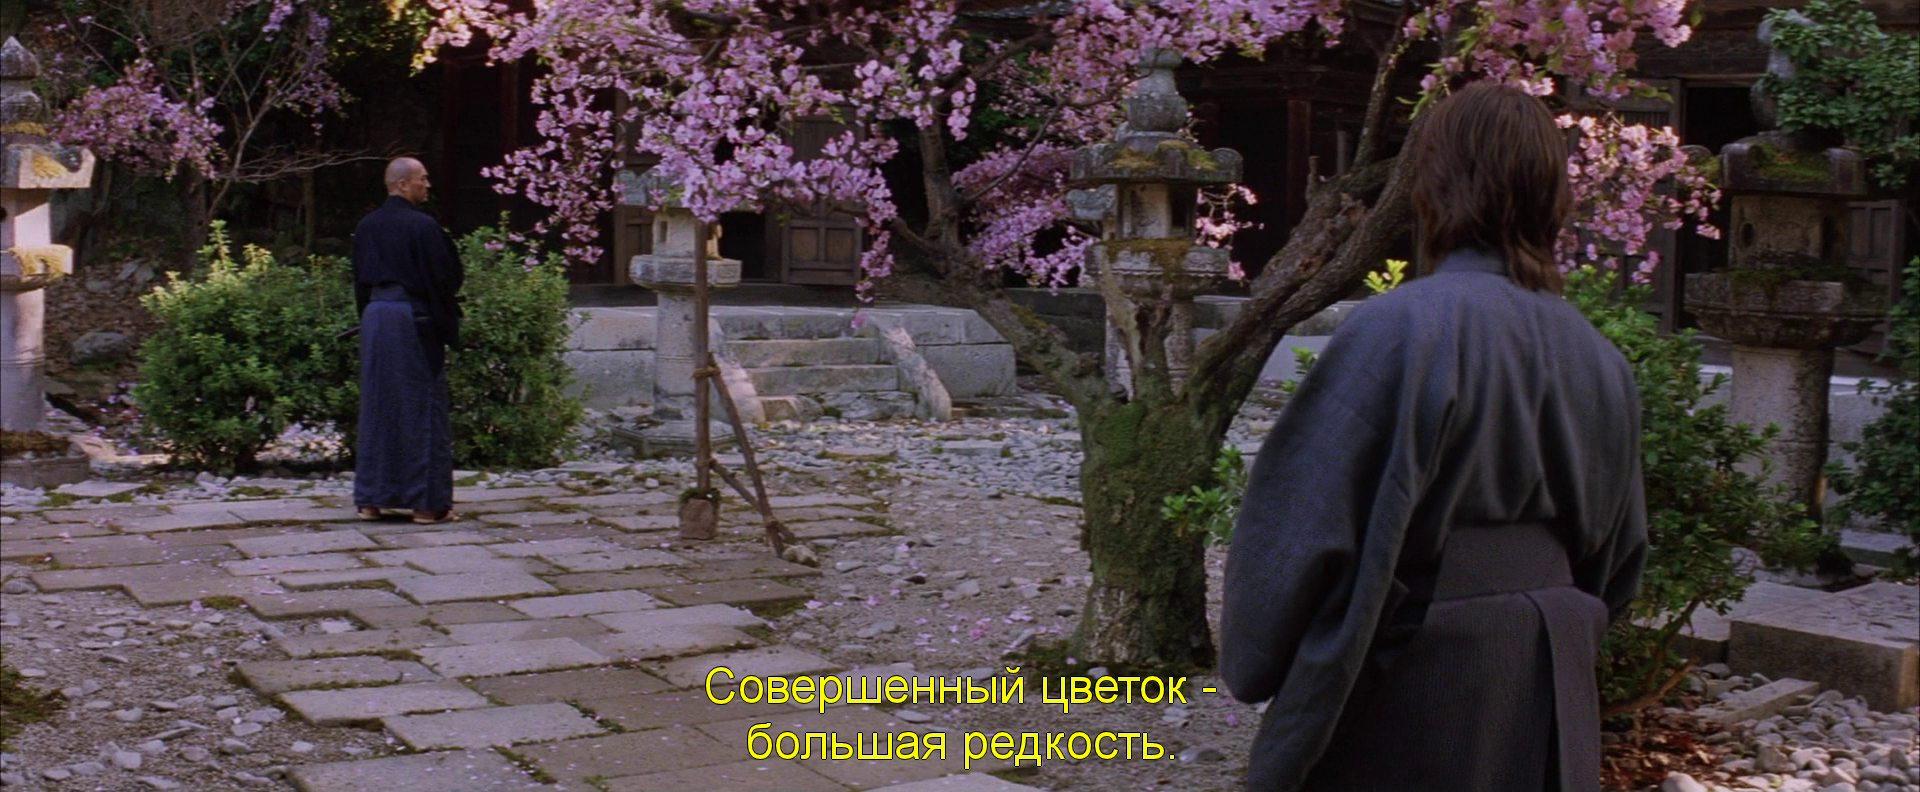 Трейлер на русском